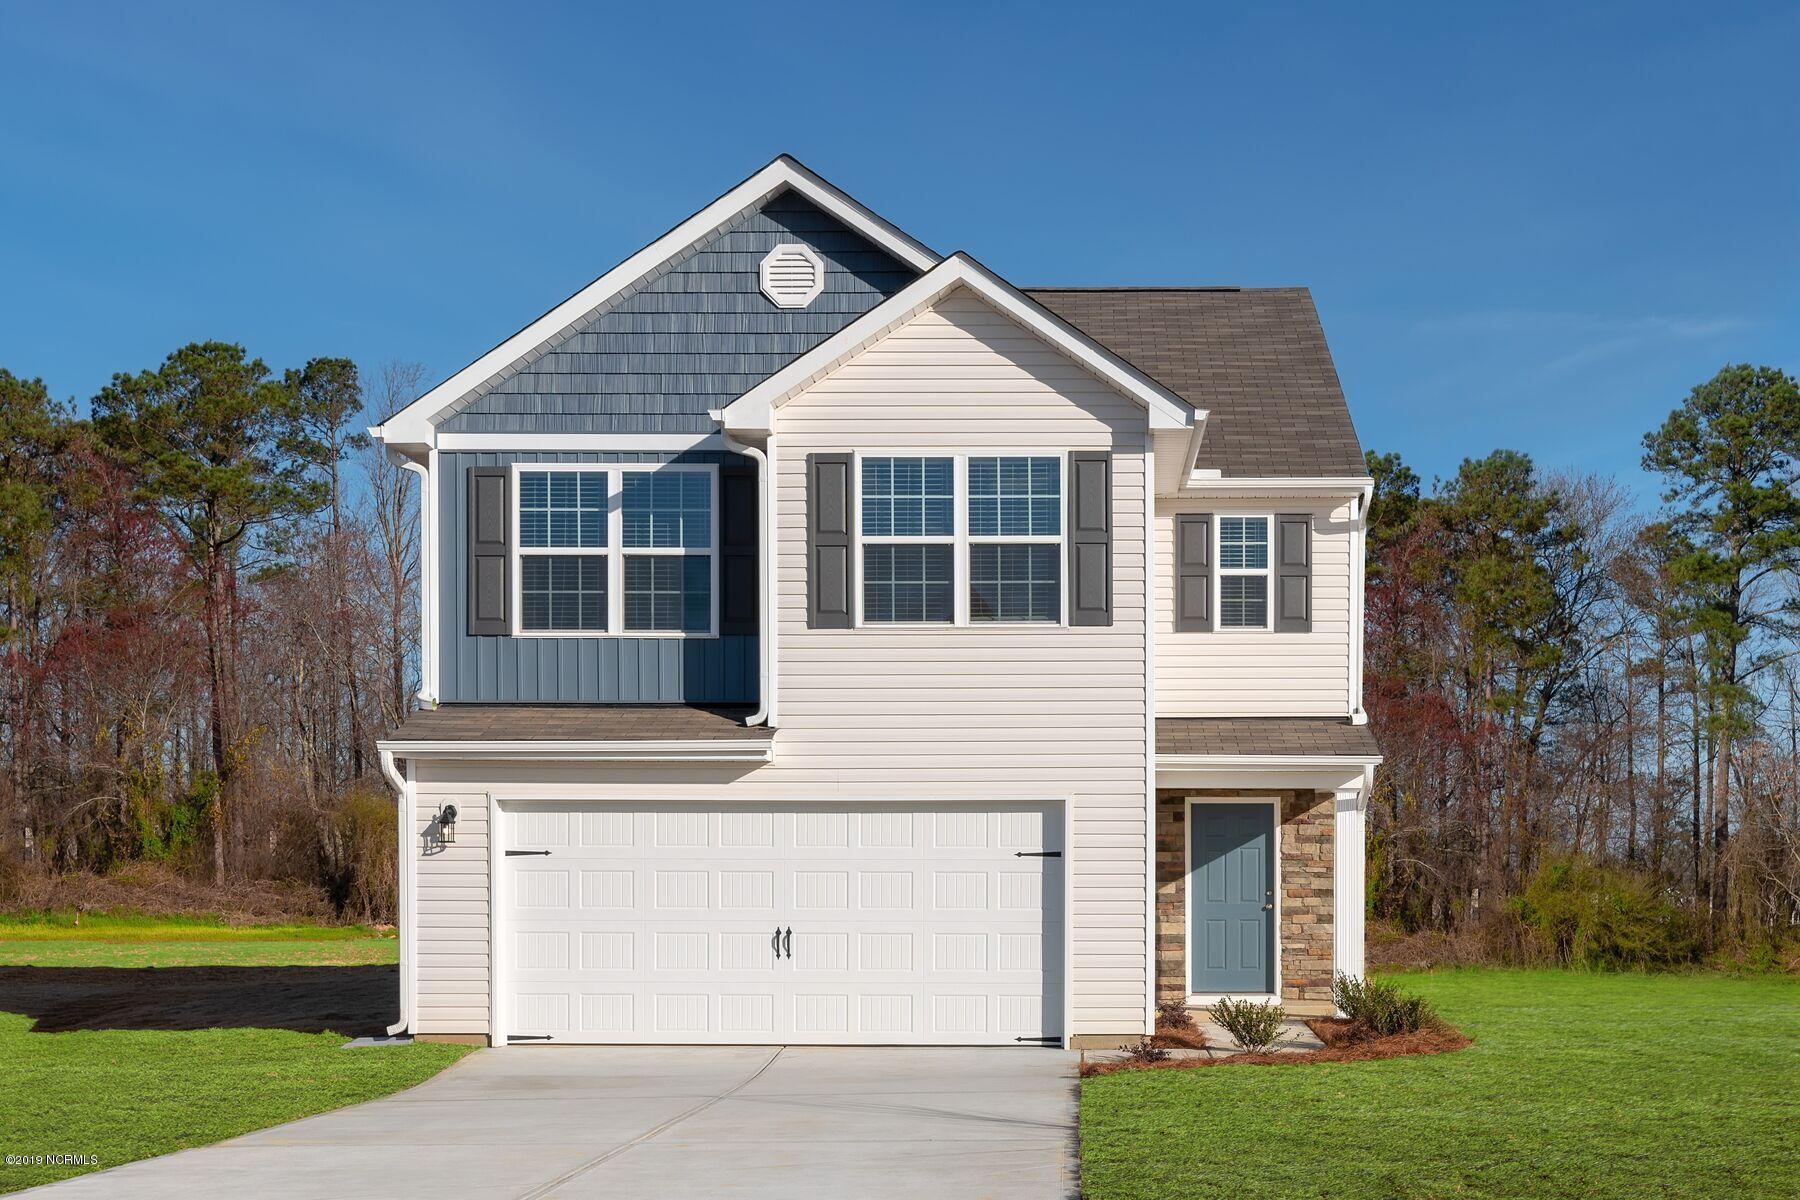 89 Luminous Way, Hampstead, North Carolina 28443, 3 Bedrooms Bedrooms, ,2 BathroomsBathrooms,Residential,For Sale,Luminous,100221943